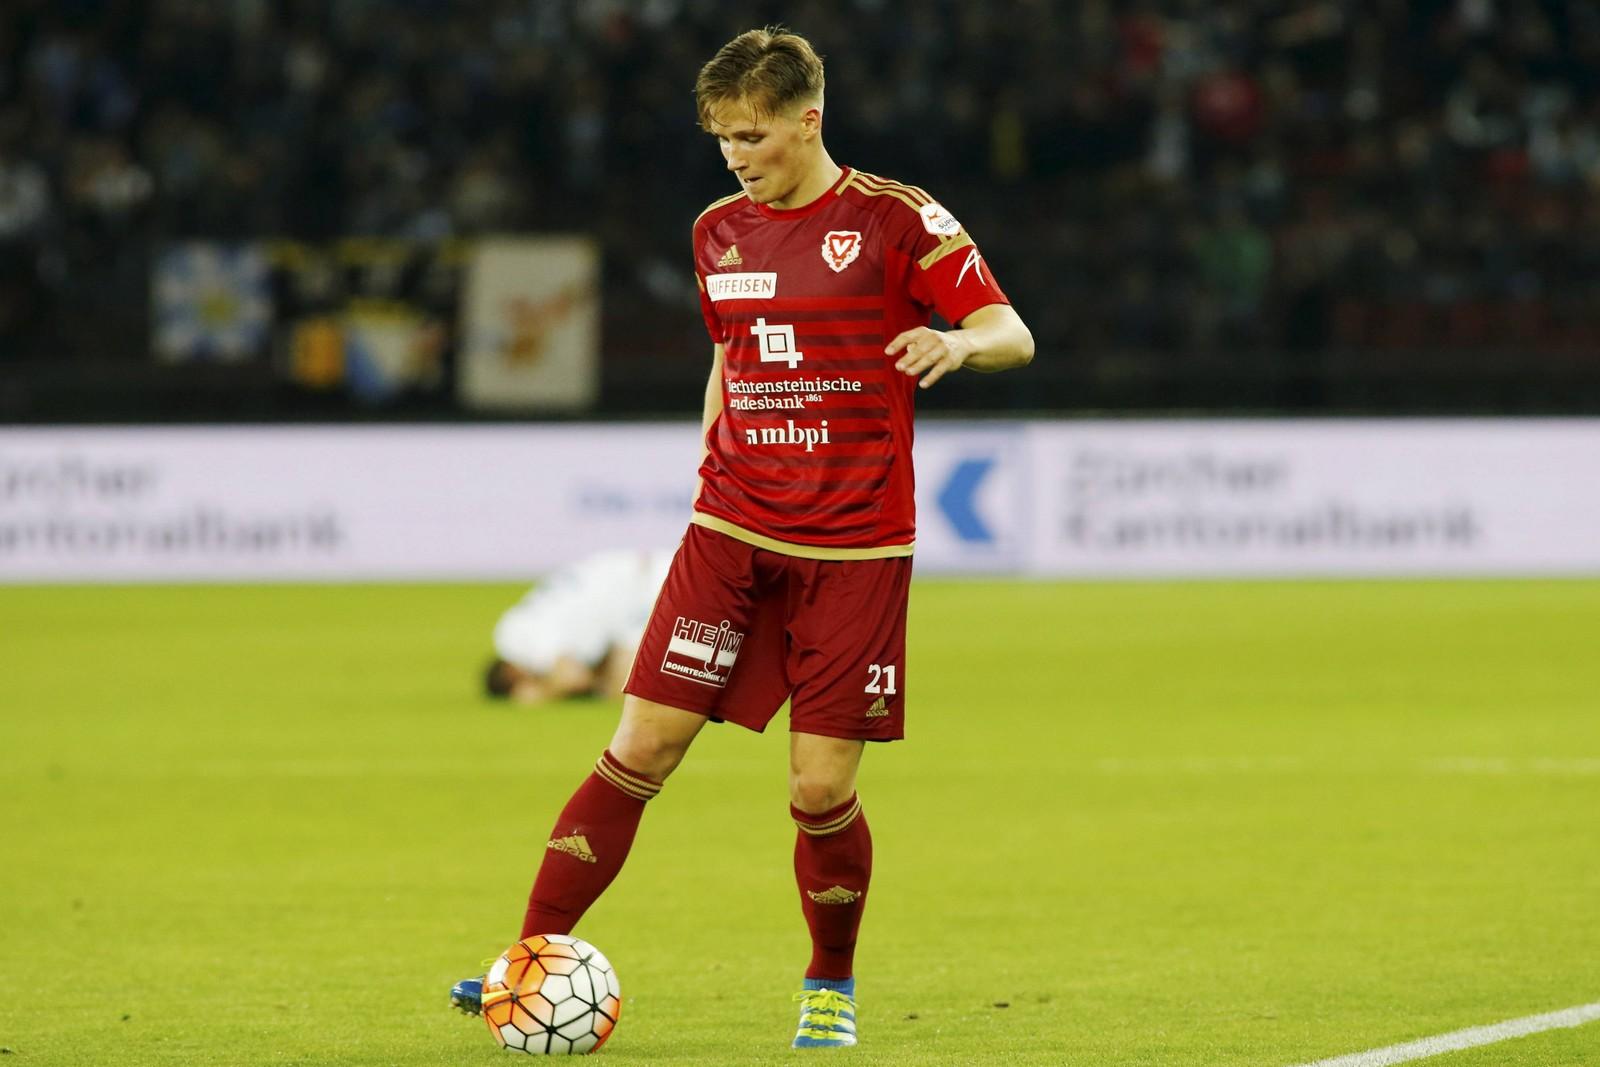 Axel Borgmann am Ball für den FC Vaduz.